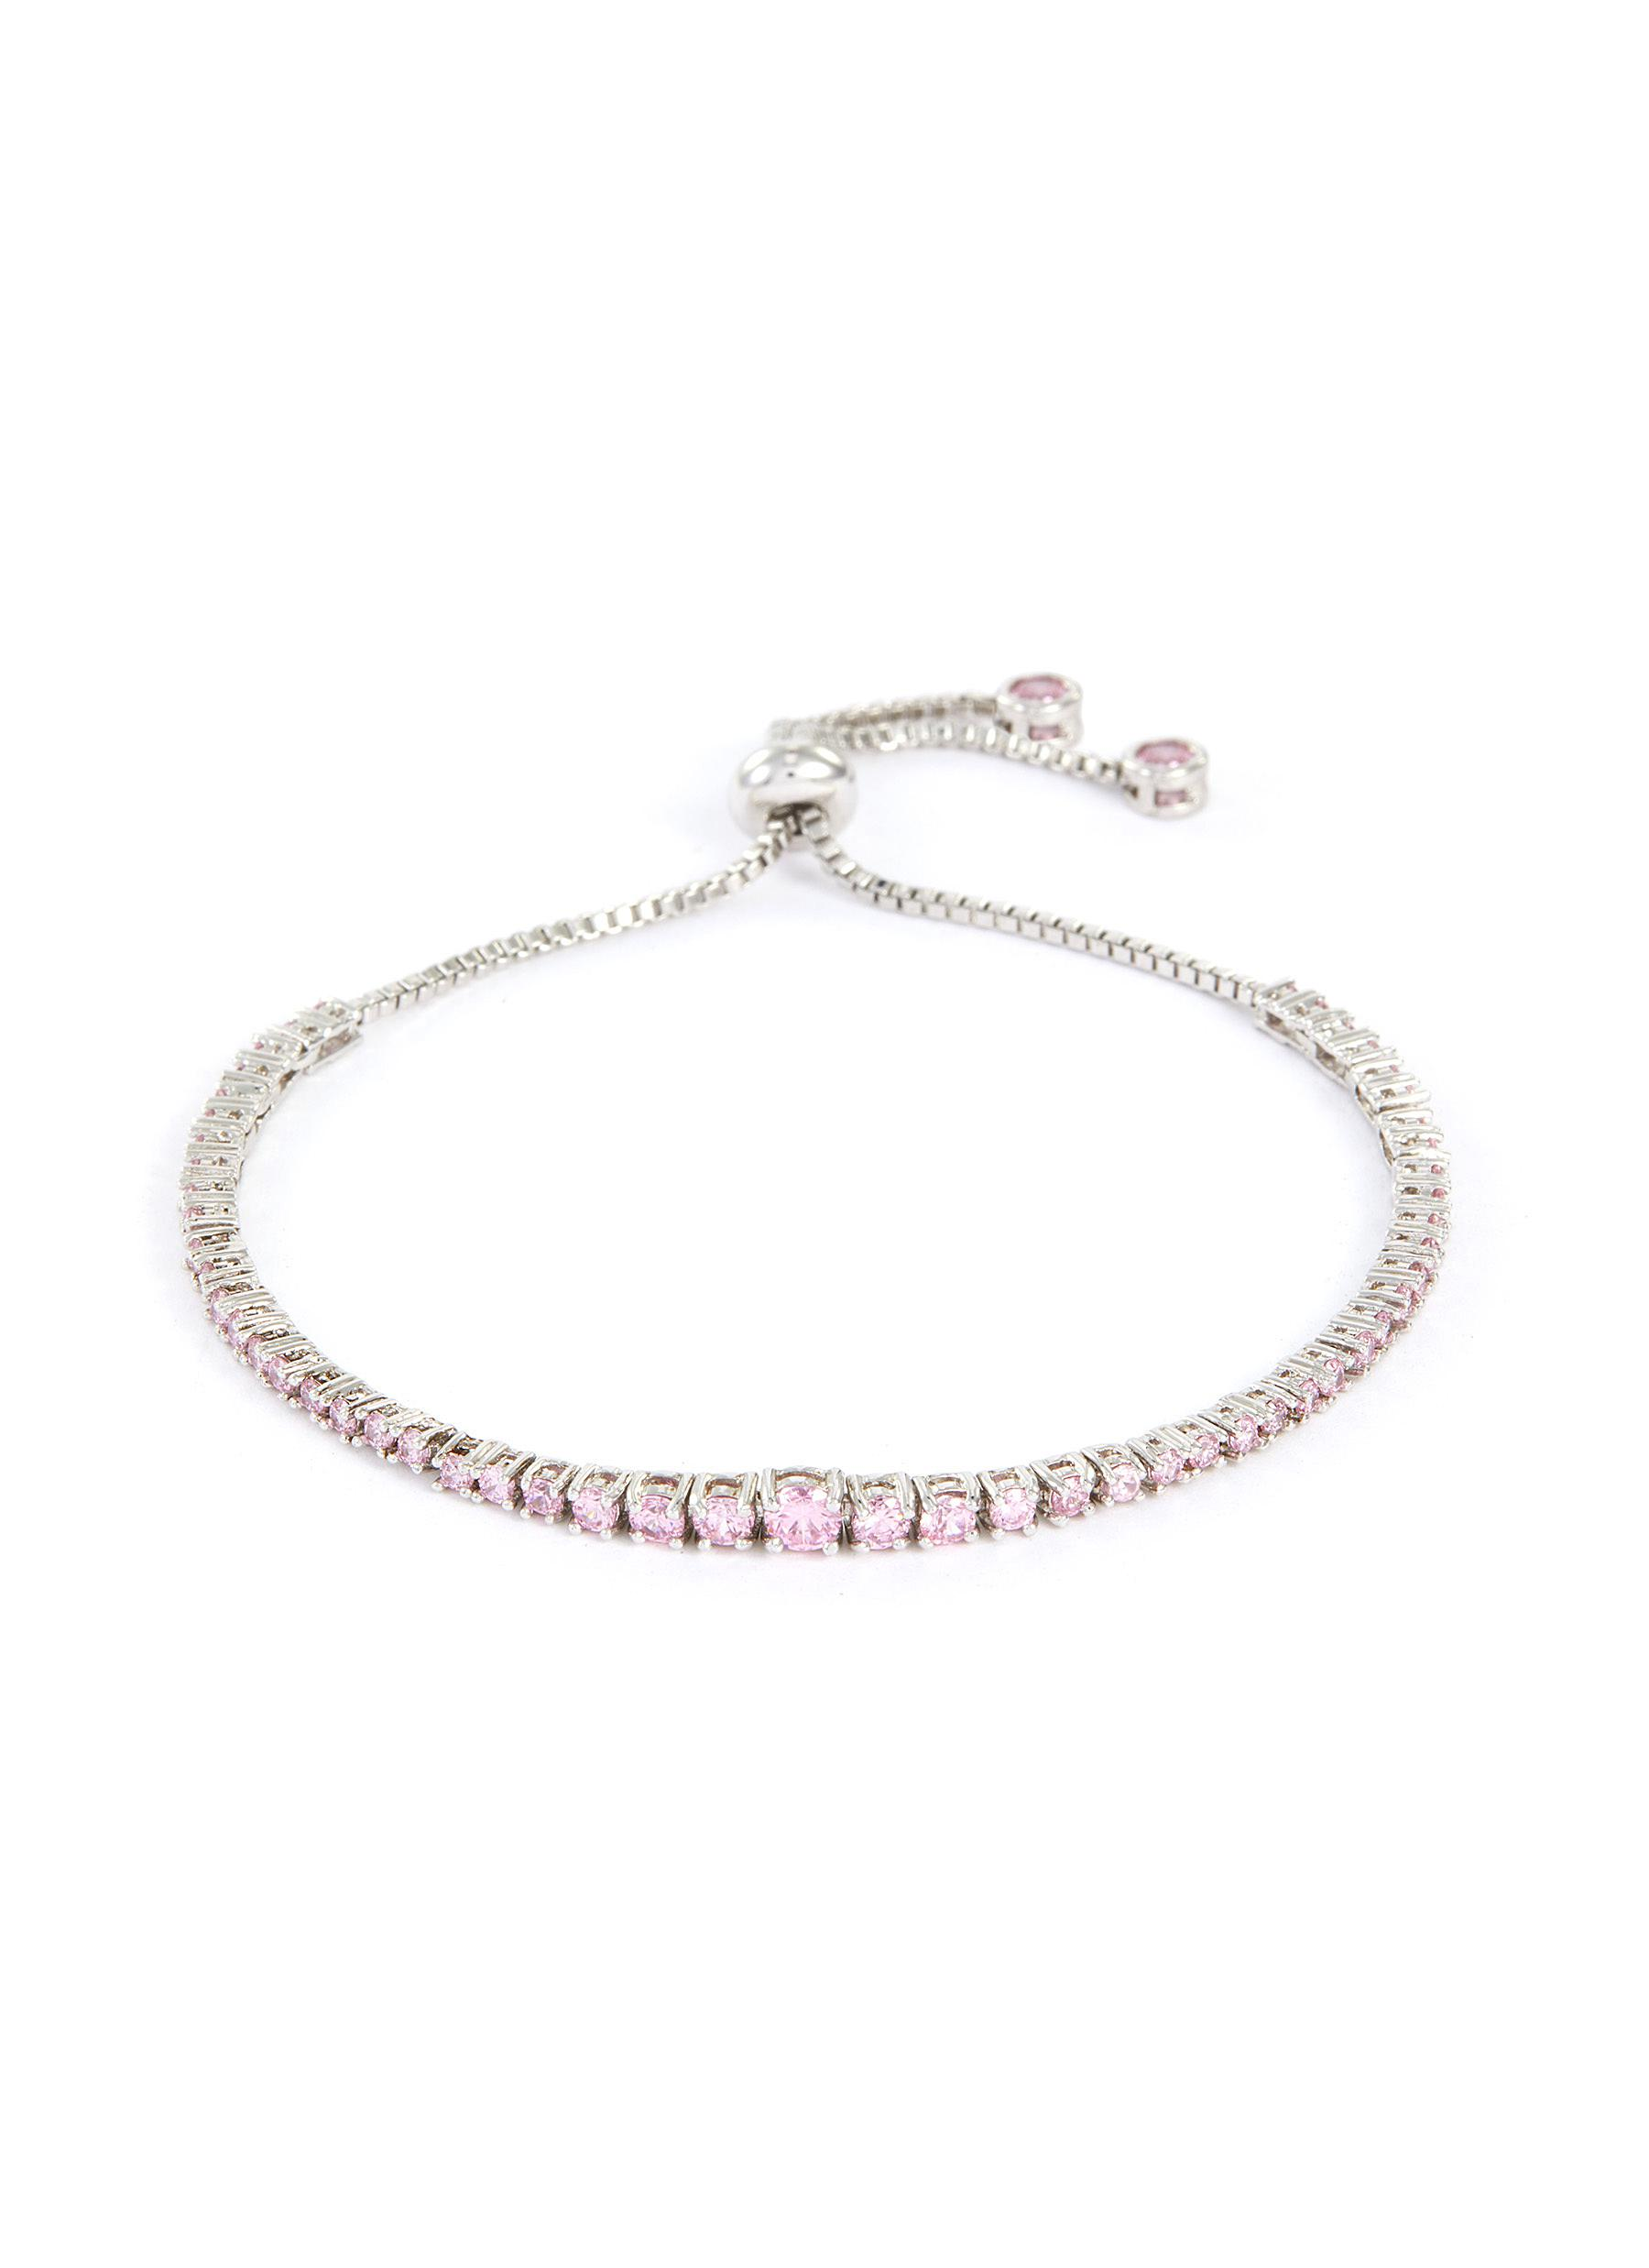 Graduate Cubic Zirconia Shamballa Bracelet